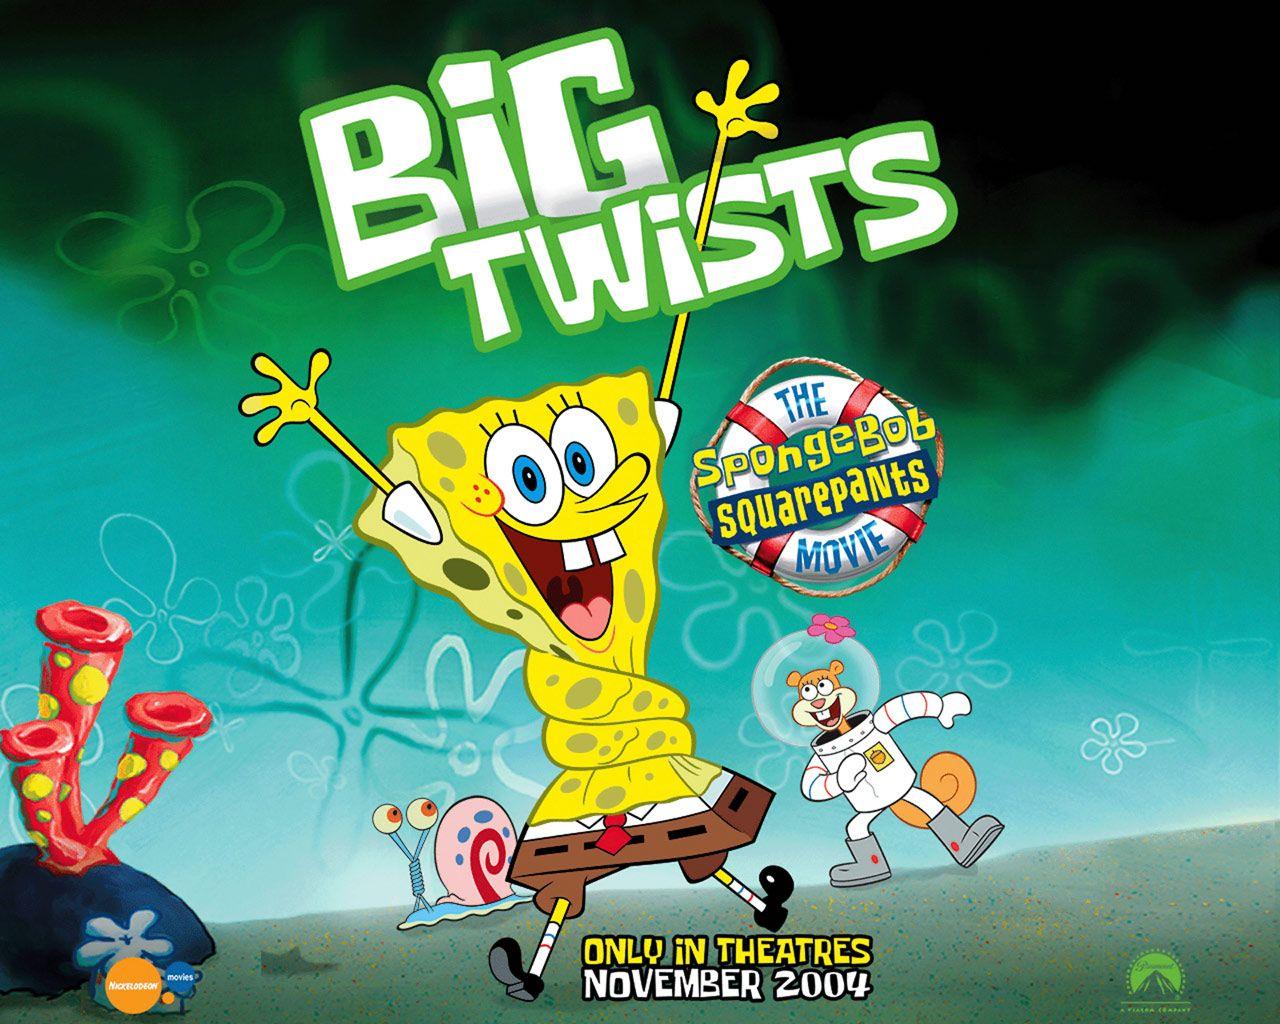 MOVIE: The SpongeBob Squarepants Movie